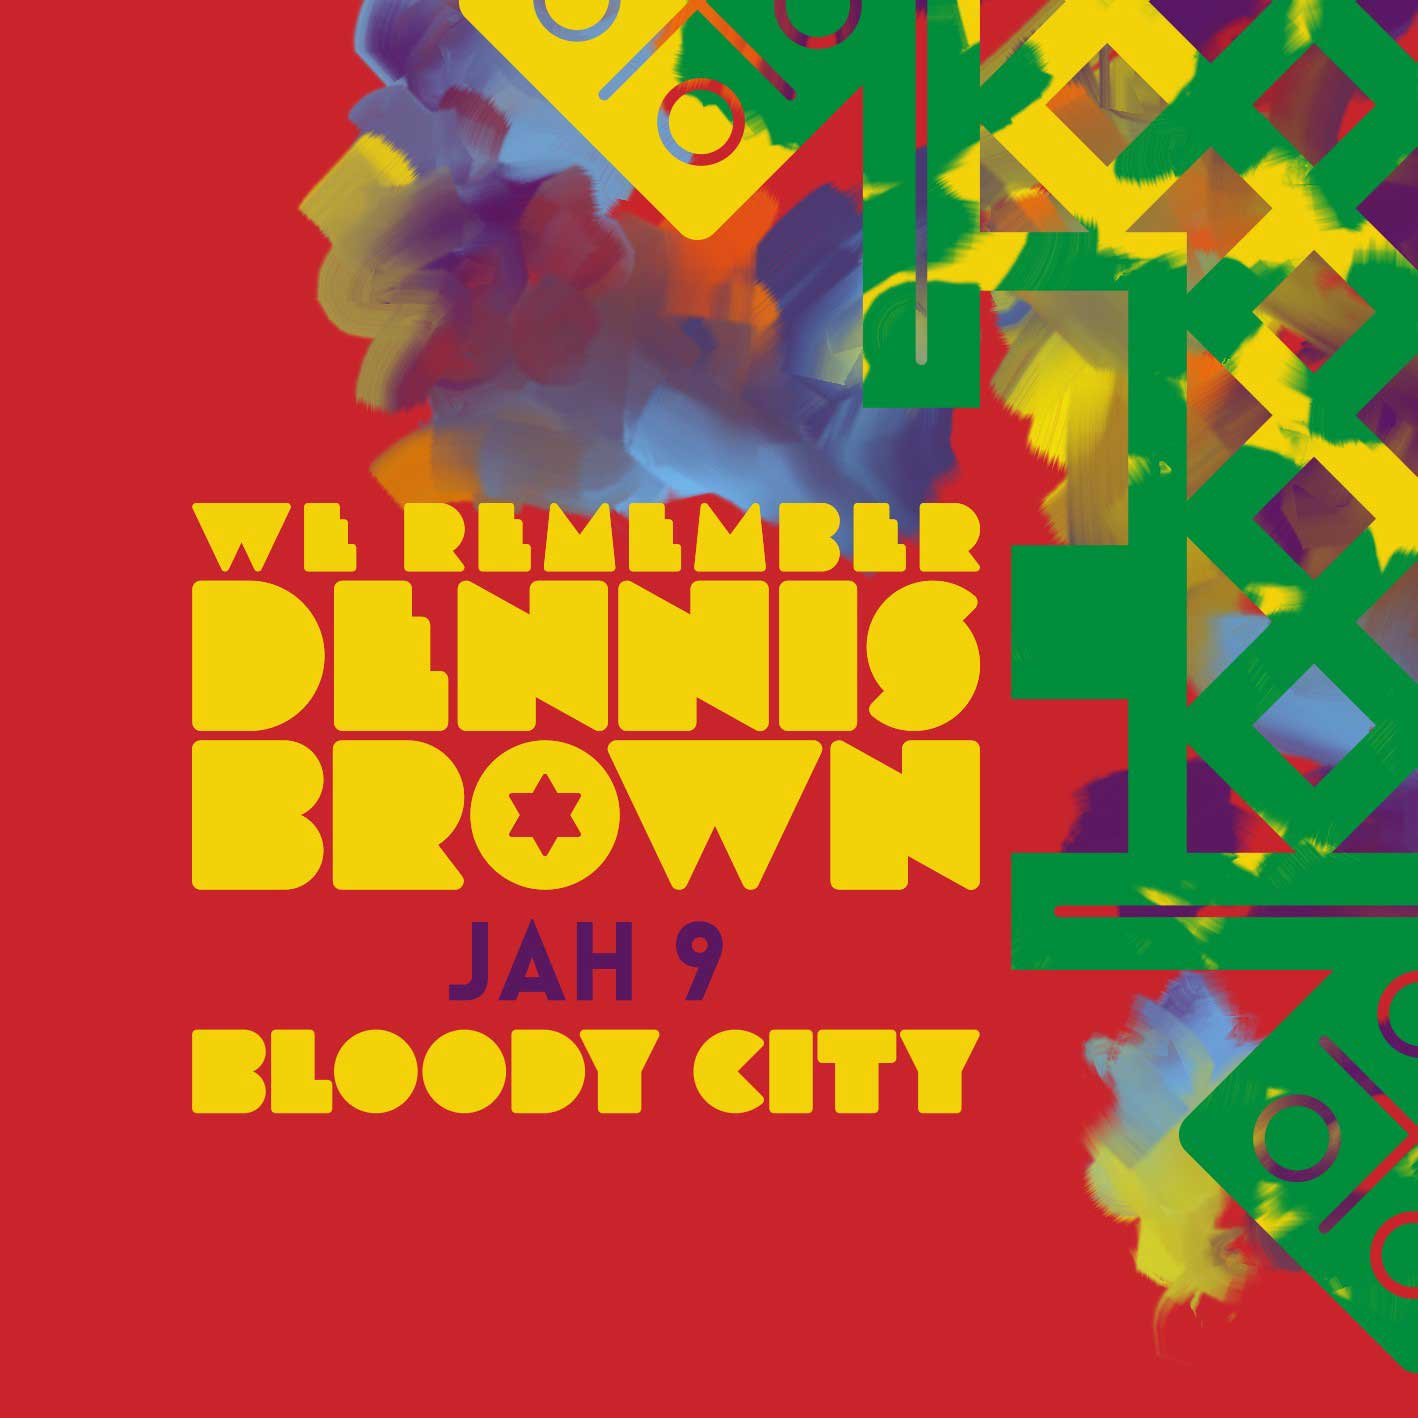 Dennis_Brown-Jah9-Bloody_City-Cover